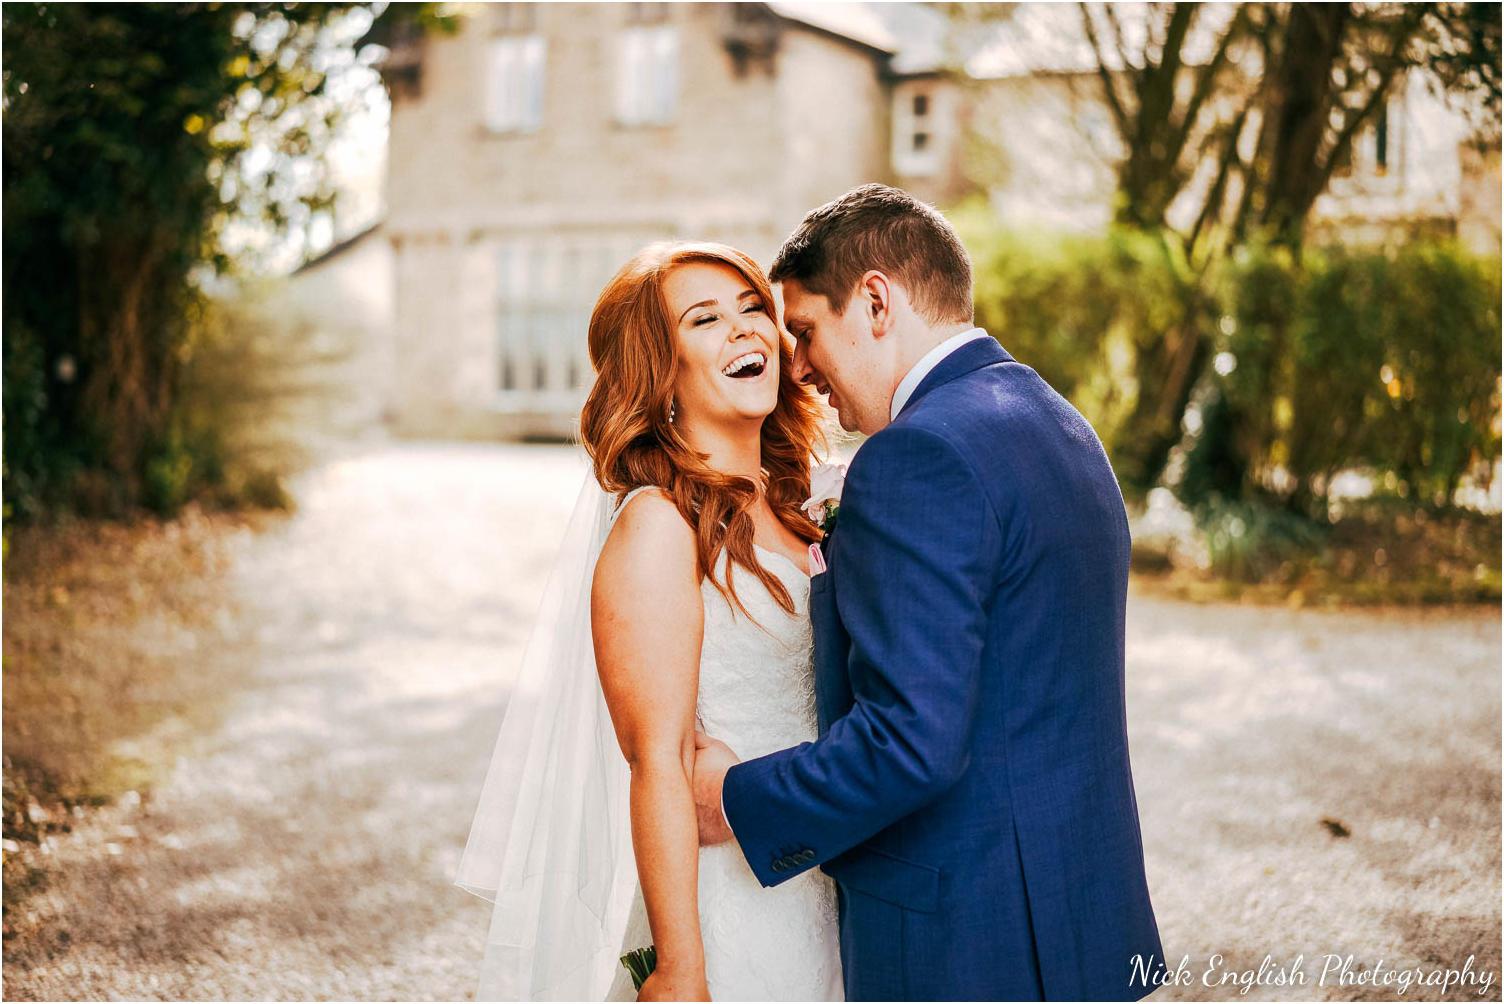 Mitton_Hall_Wedding_Photographer-126.jpg